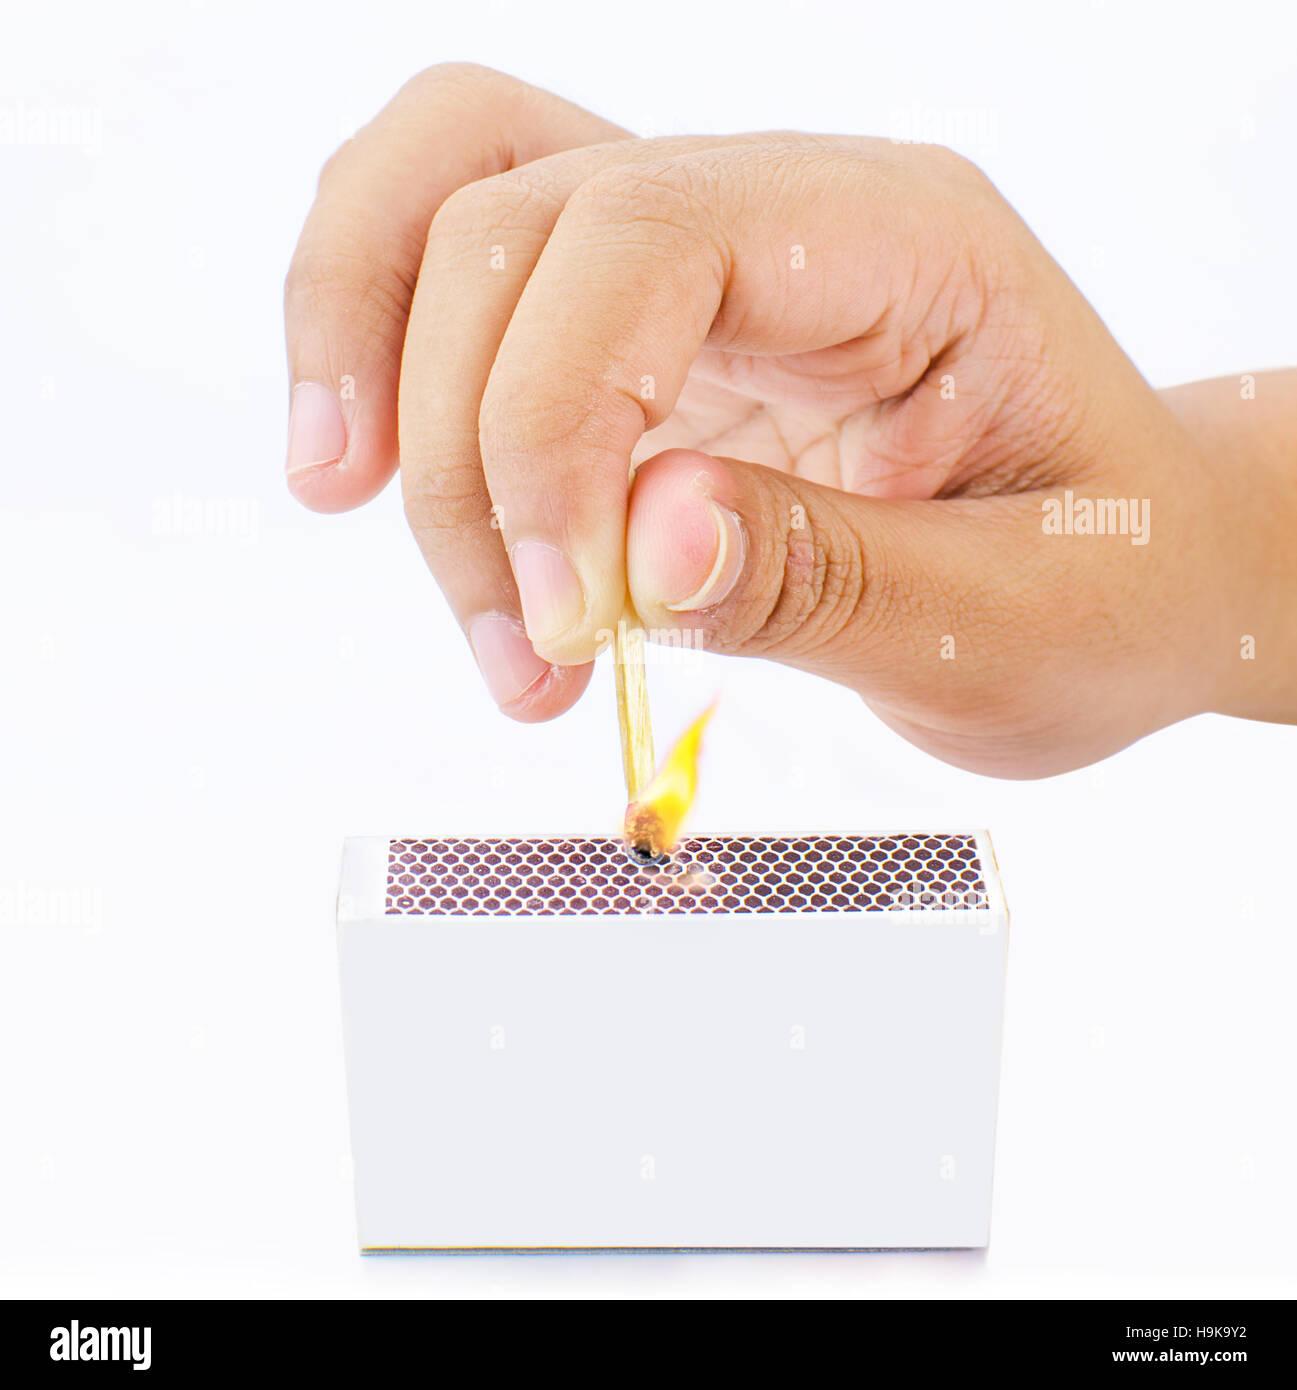 Burning match stick in white background - Stock Image